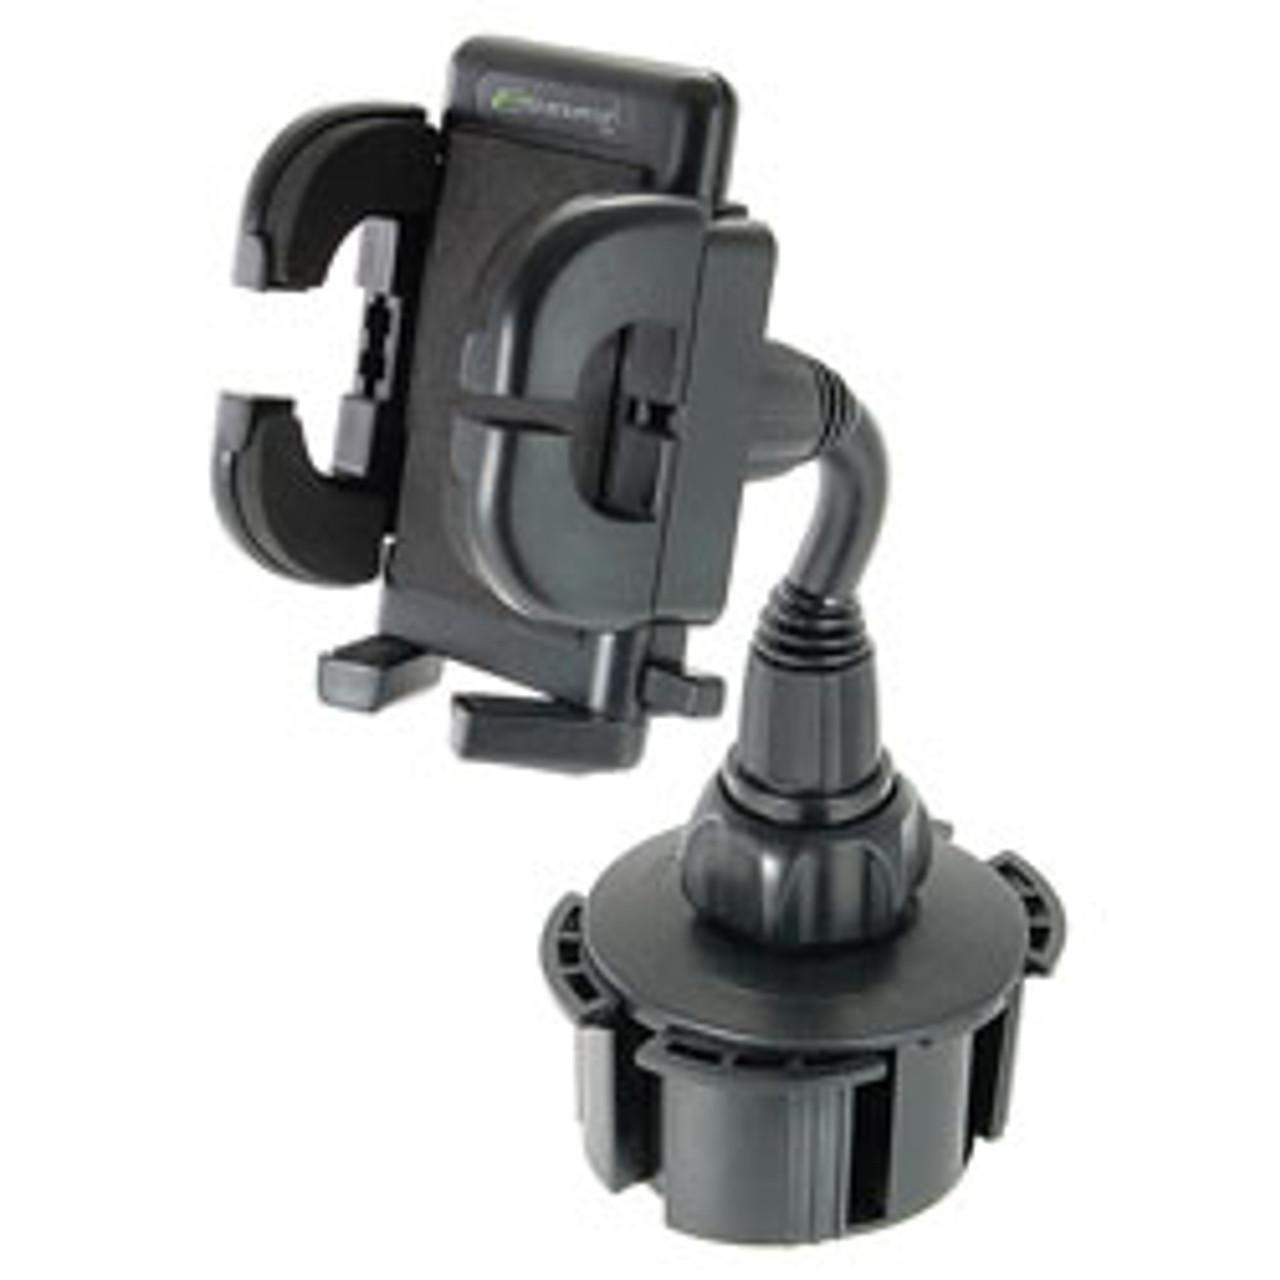 Bracketron UCH-101-BL Mobile Dock-iT Universal Cup Holder Mount Kit